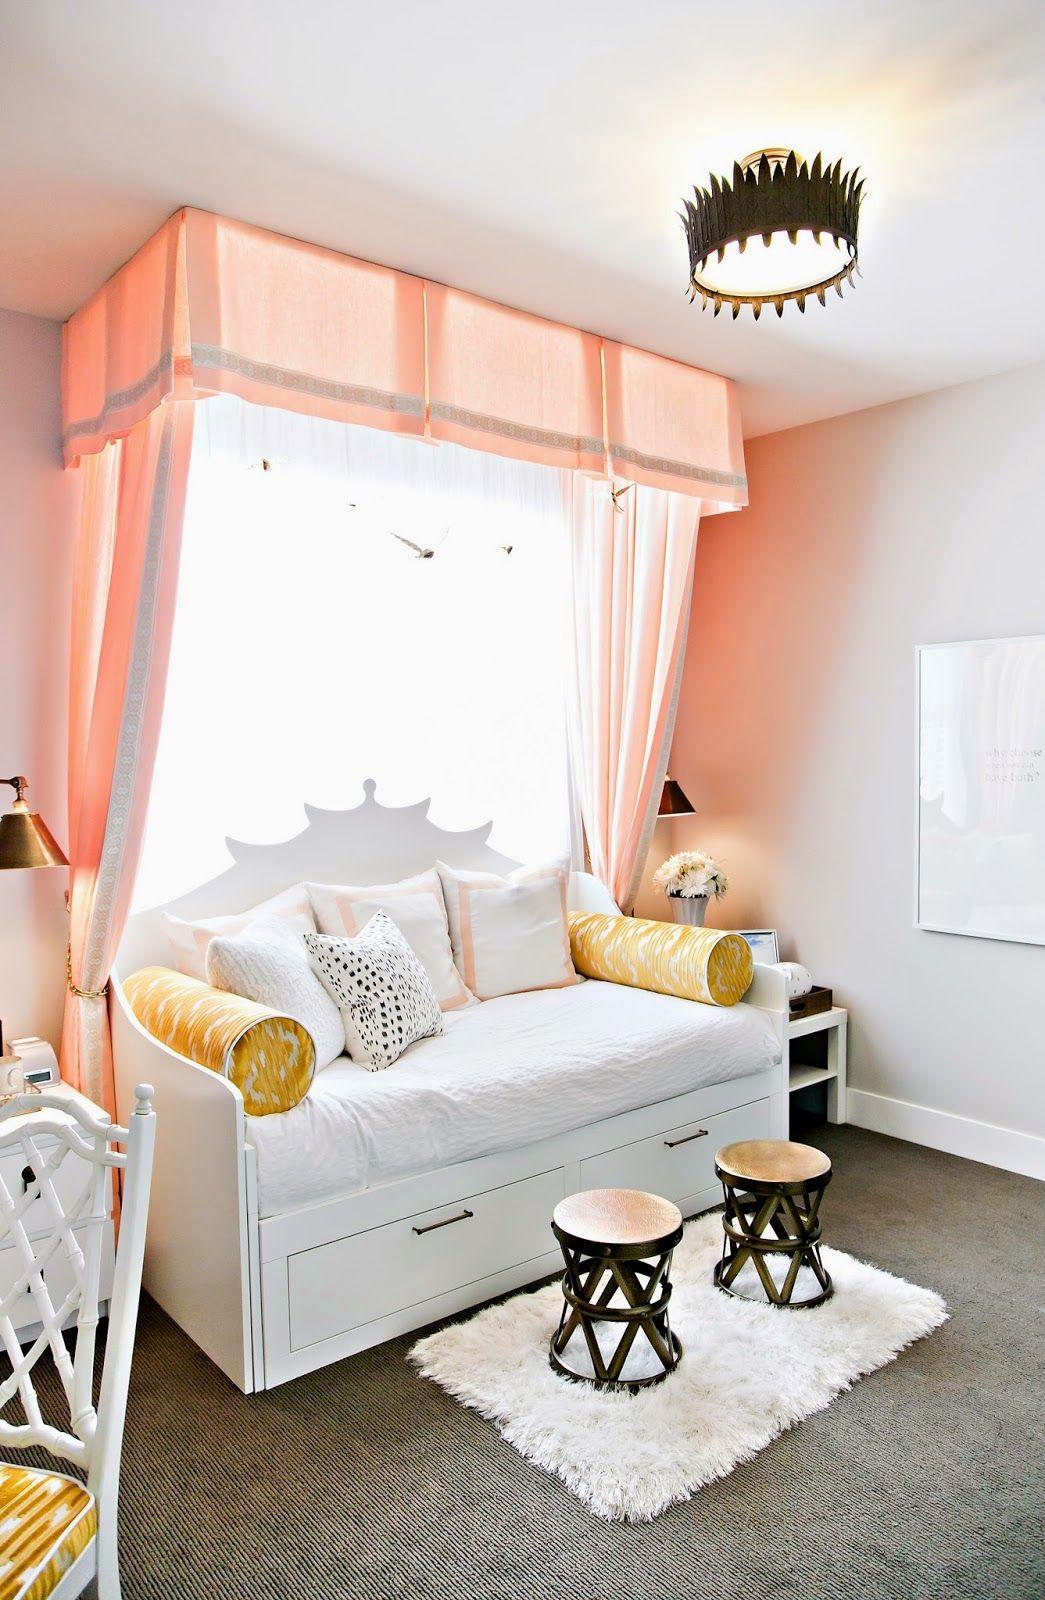 Teen Bedroom Decor Best Design Dump Orc Finale A Teen Bedroom In Peach  Mustard  New Decorating Inspiration